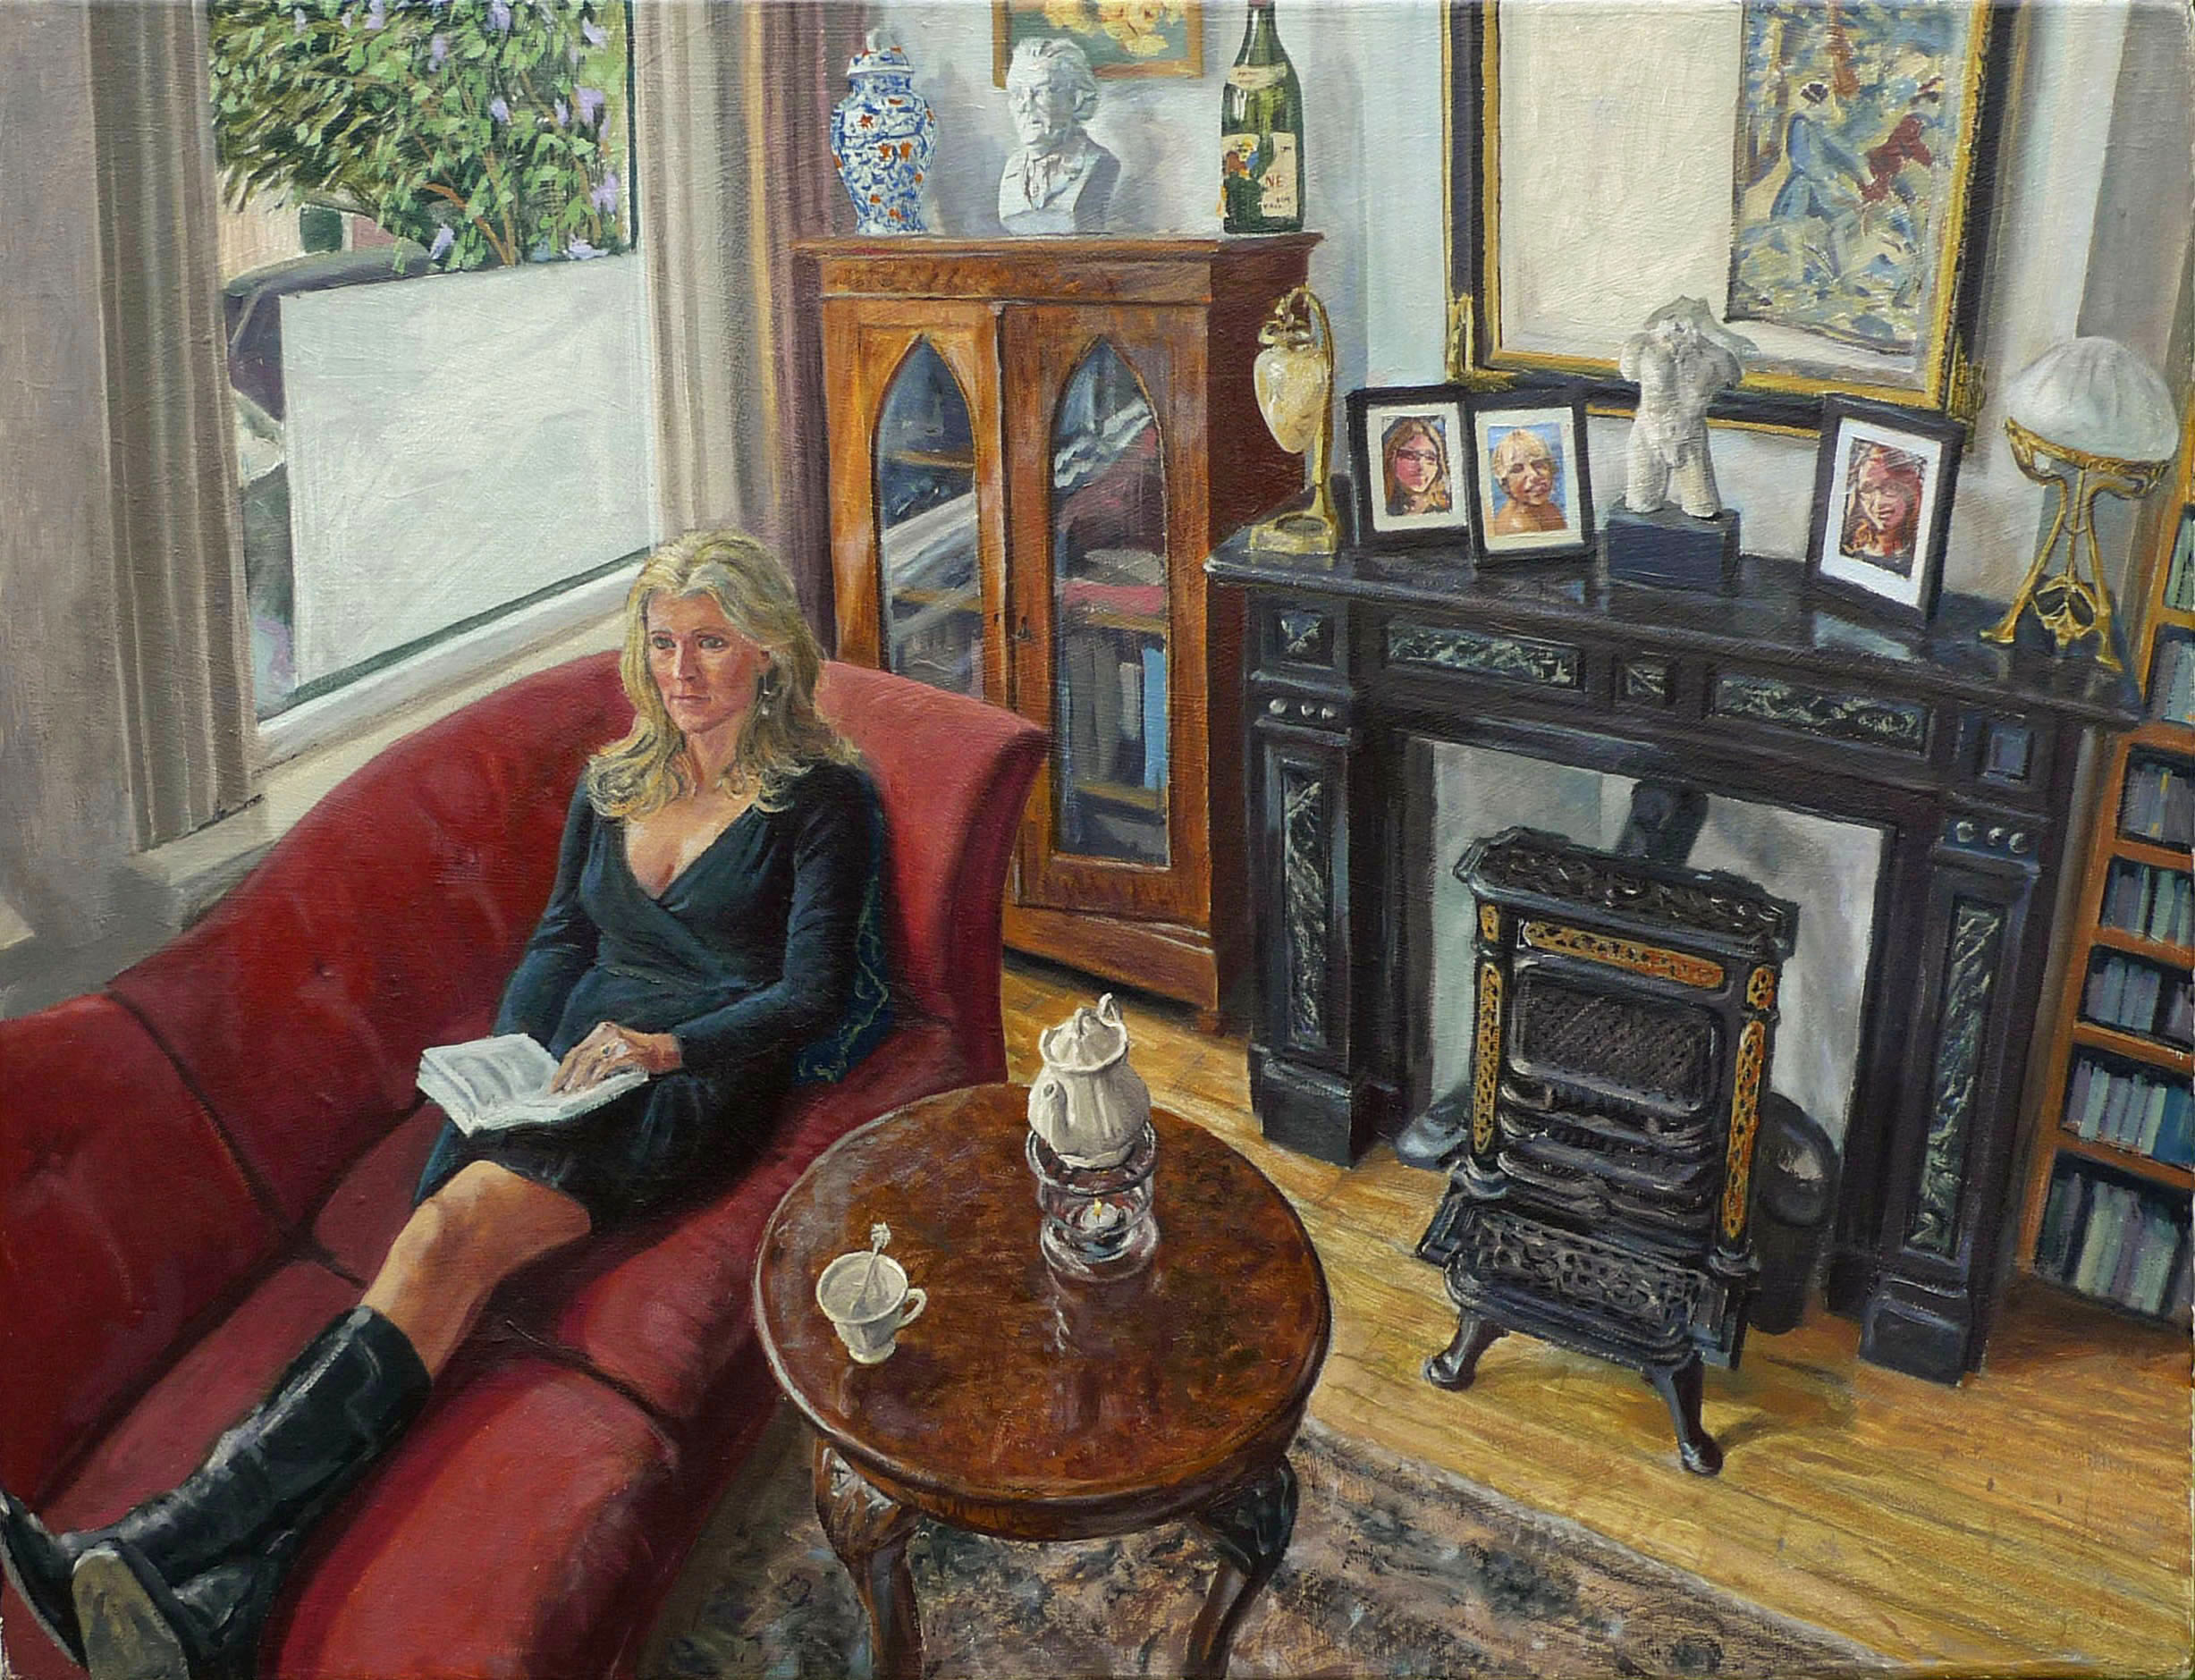 In opdracht: Sophie, 2009